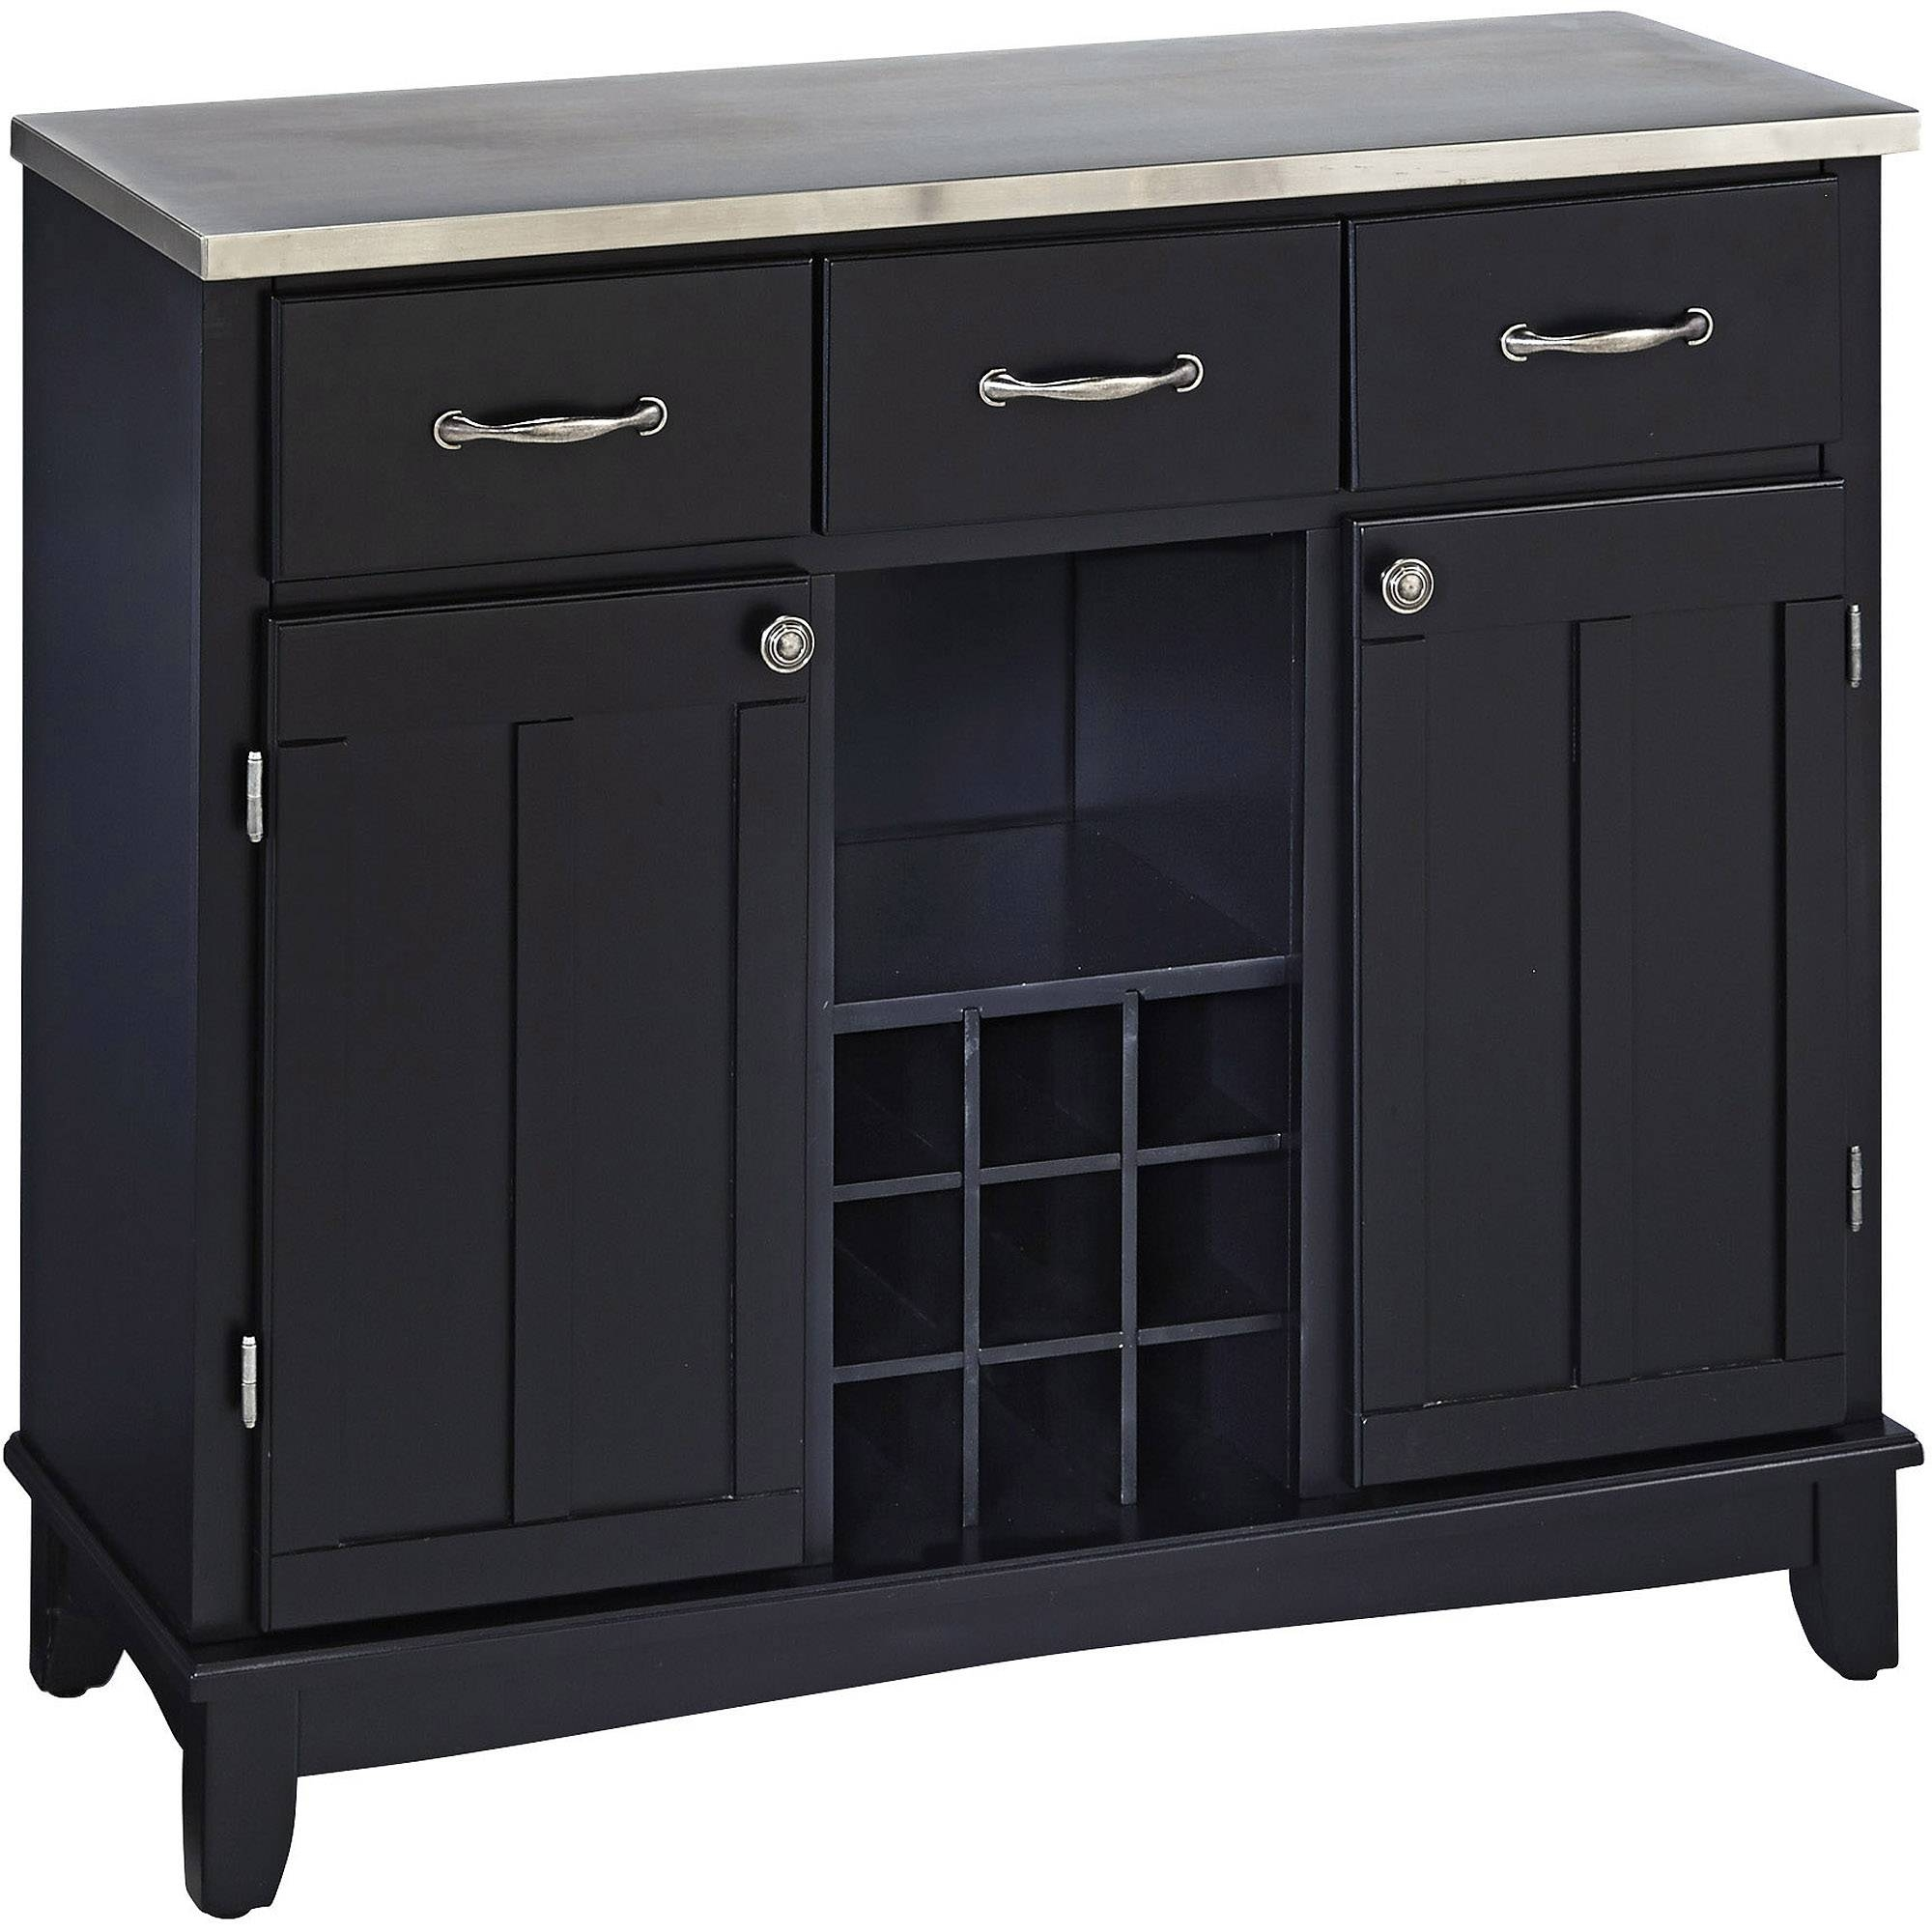 China Cabinet & Buffet Furniture : Kitchen & Dining Furniture within Dark Sideboards Furniture (Image 7 of 30)